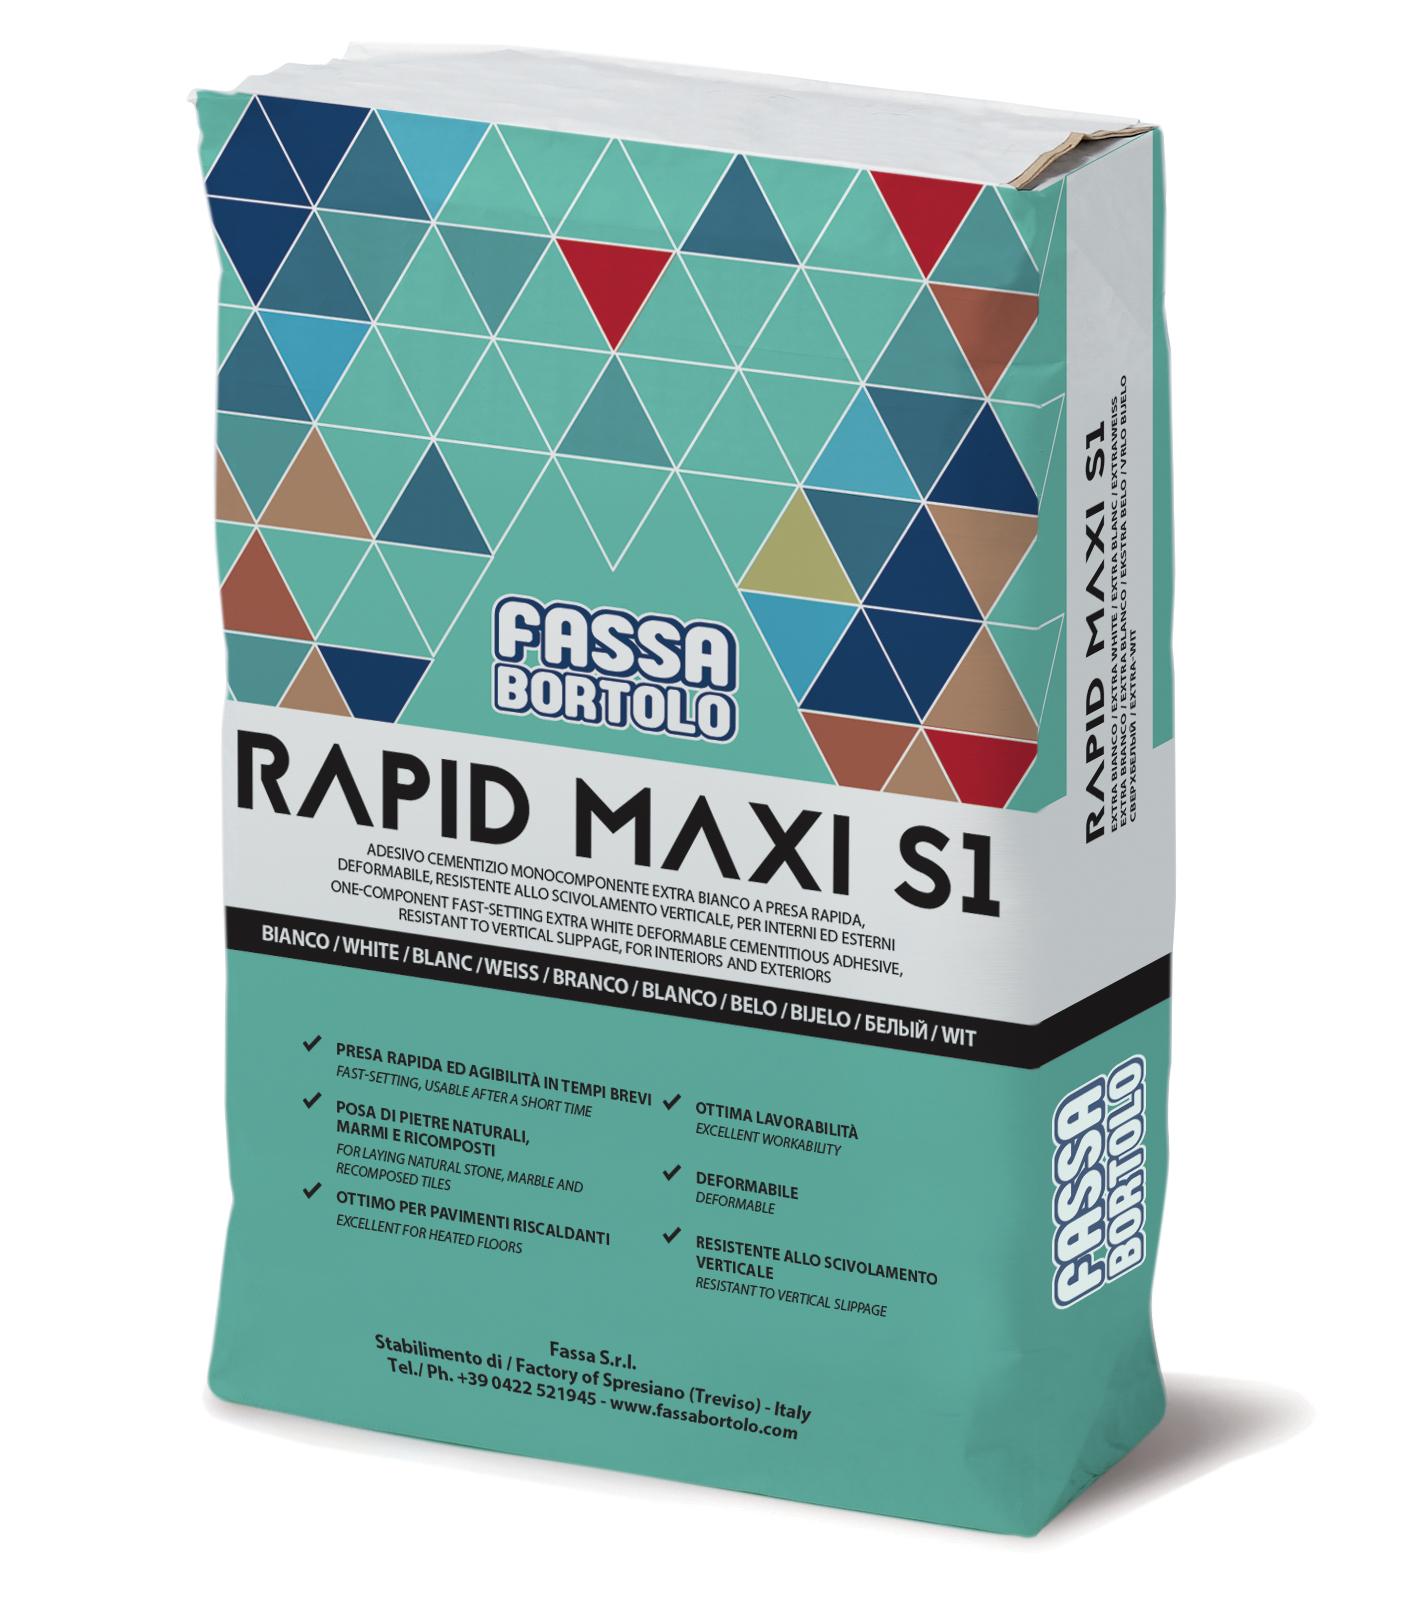 RAPID MAXI S1: Cimento cola monocomponente de presa rápida, boa elasticidade, extra-branca e cinzenta, para pavimentos e revestimentos tanto exteriores como interiores